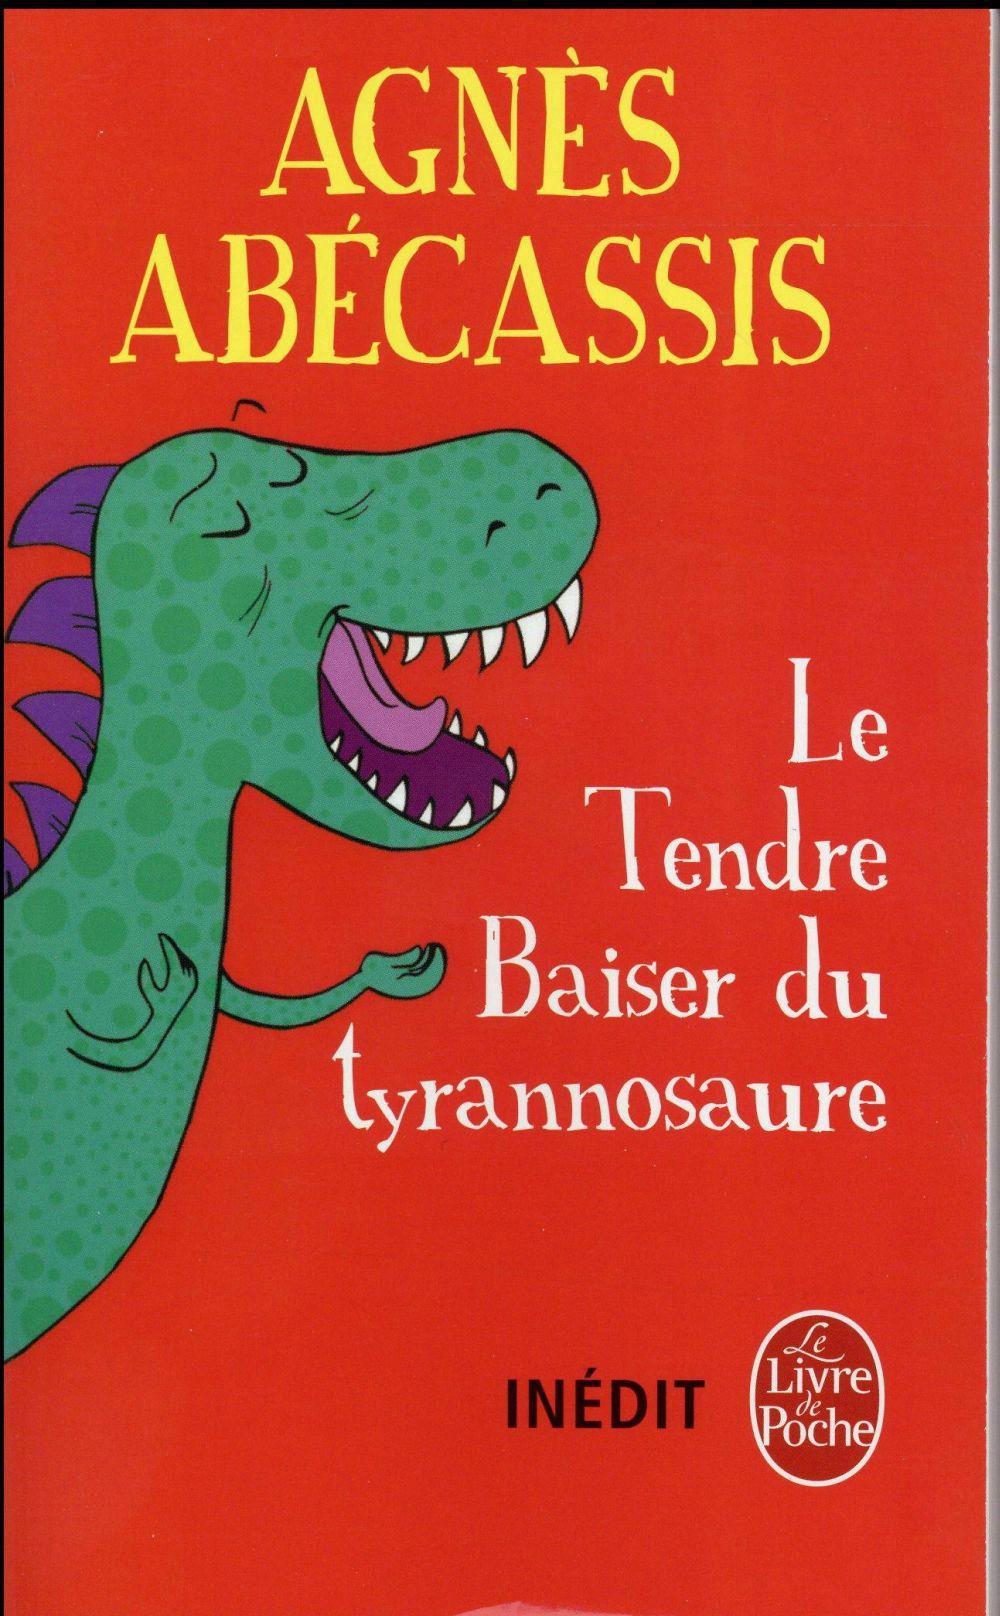 Agnes-Abecassis-tyrannosaure